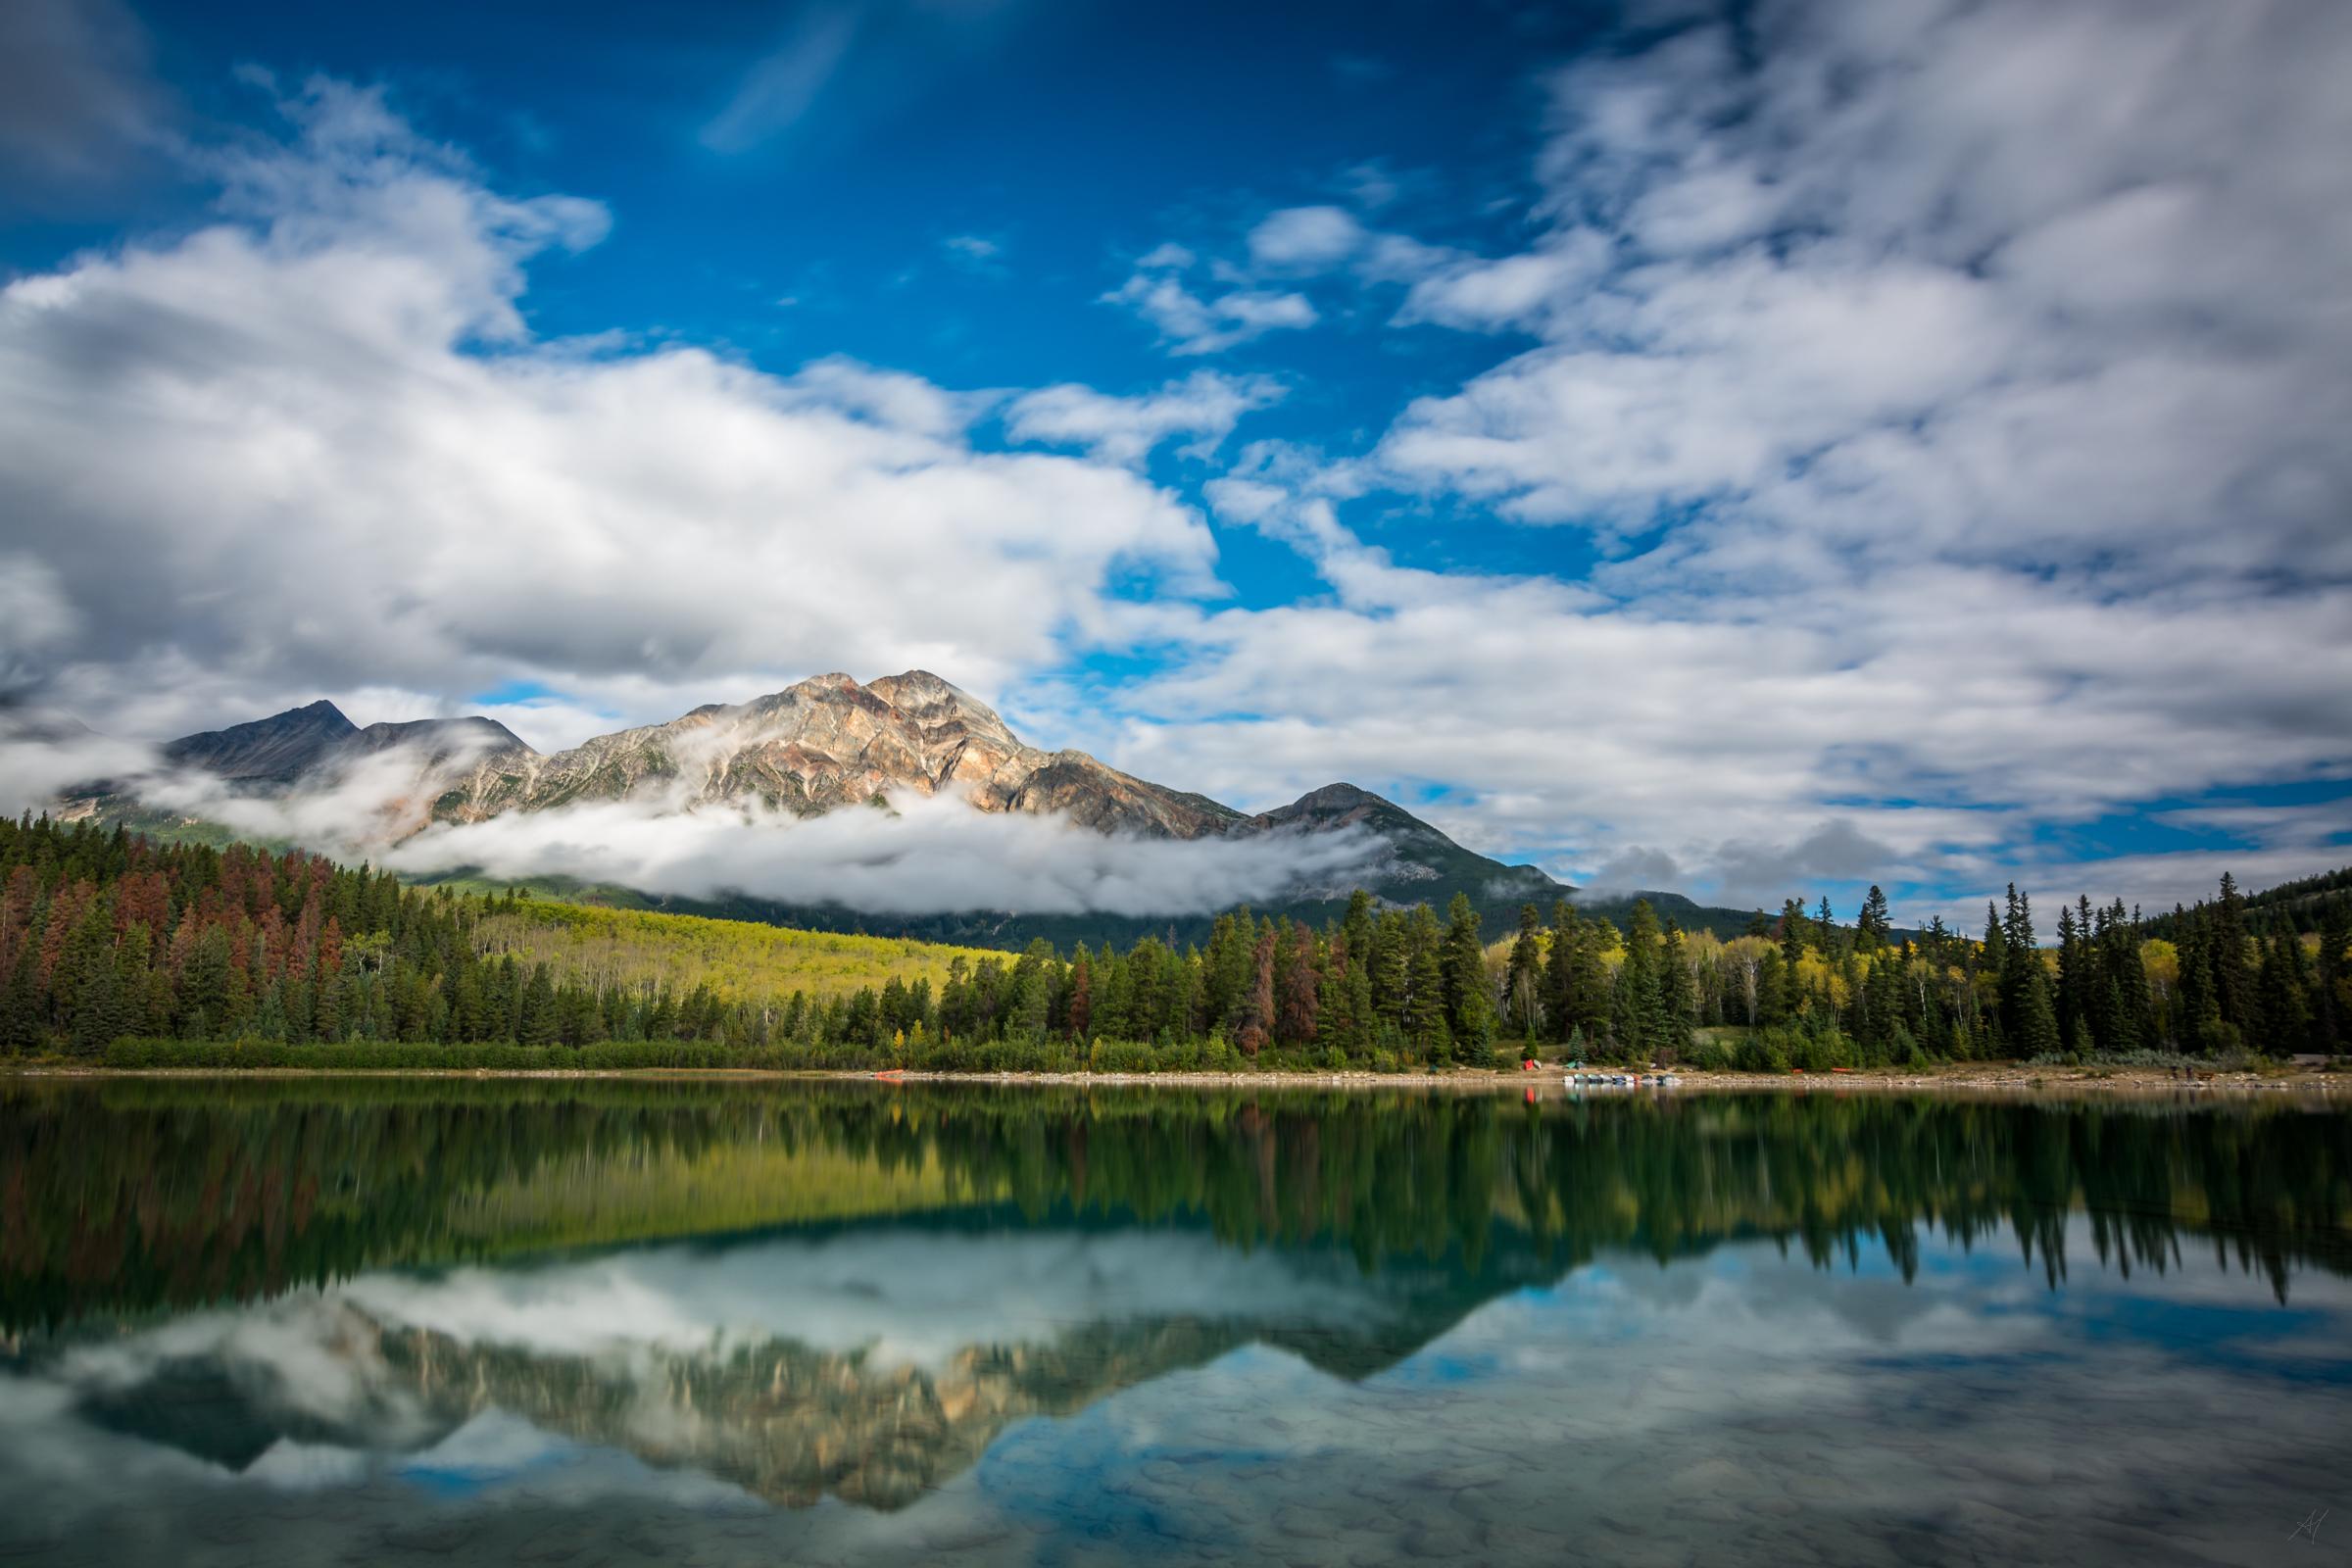 Day 3 - Patricia Lake